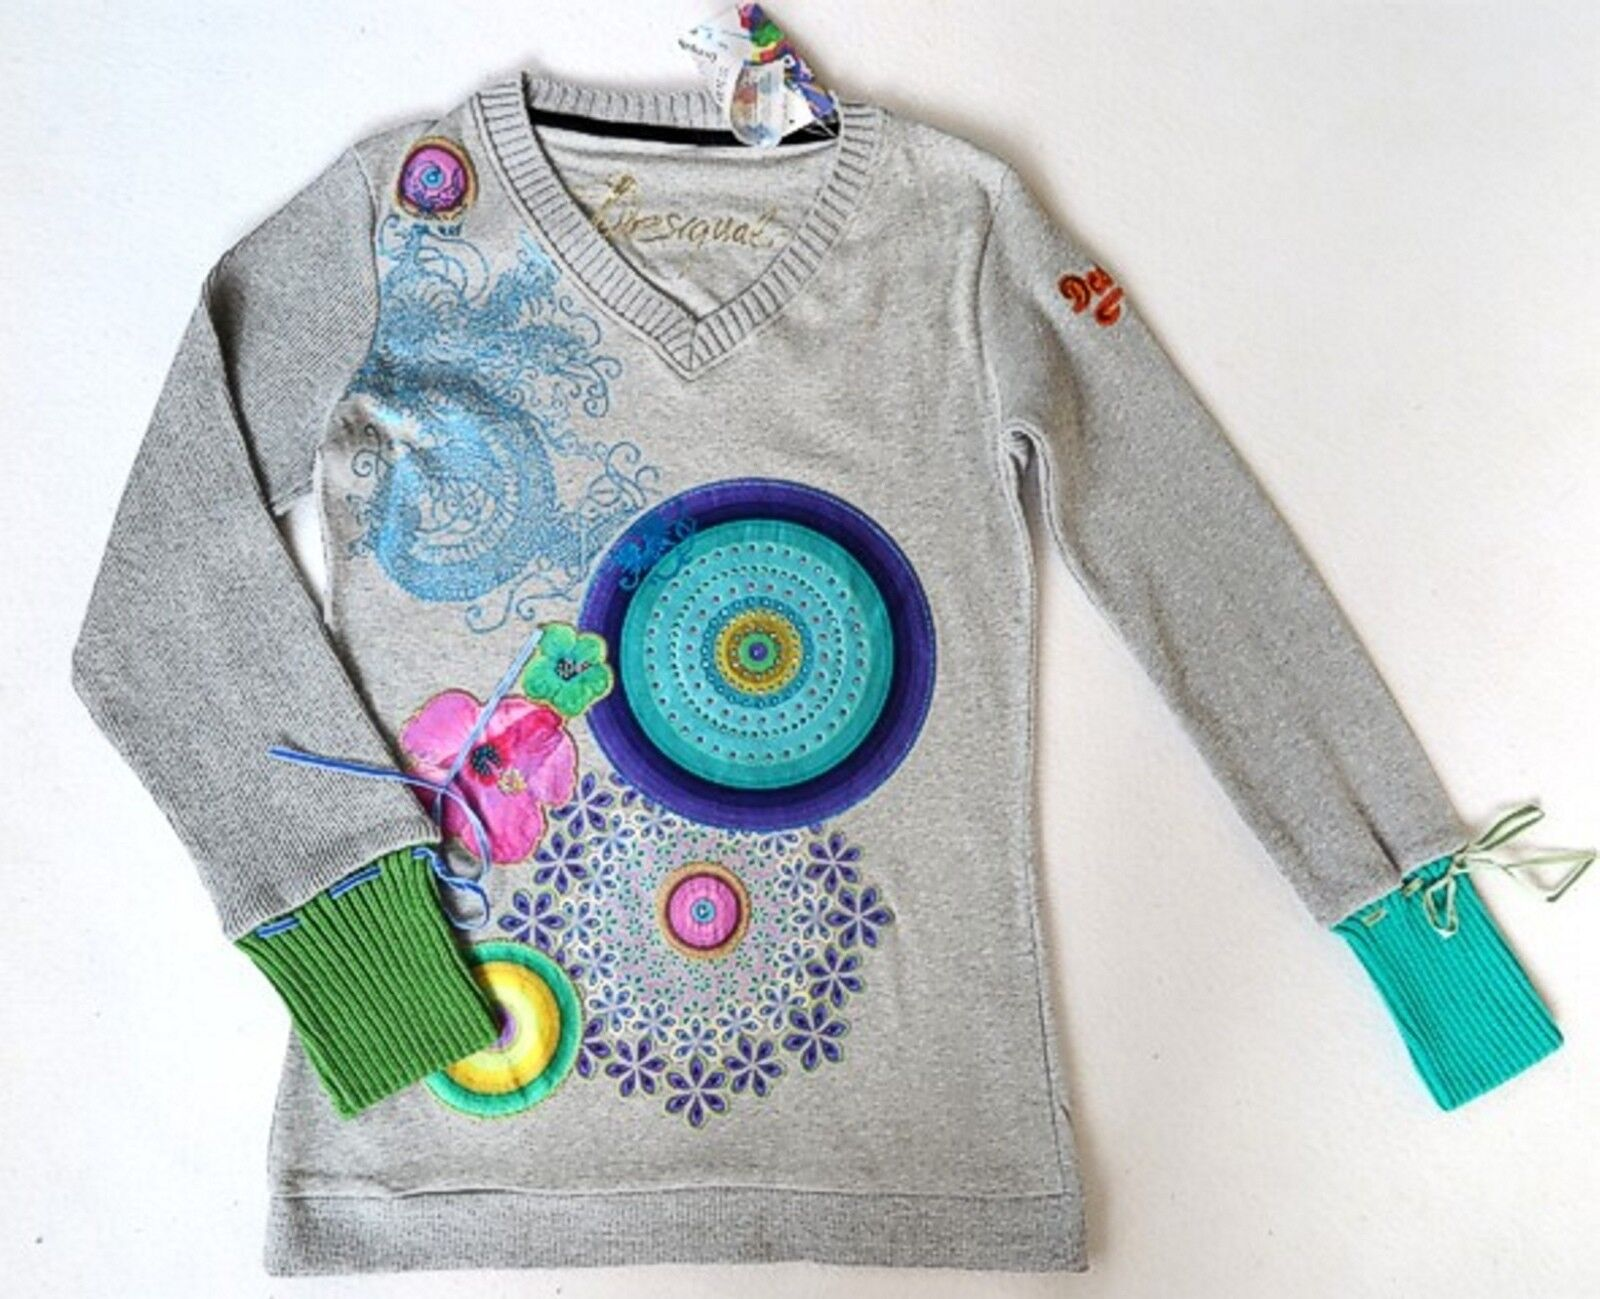 DESIGUAL Sweatshirt   TOUR    Gr. M 36  NEU